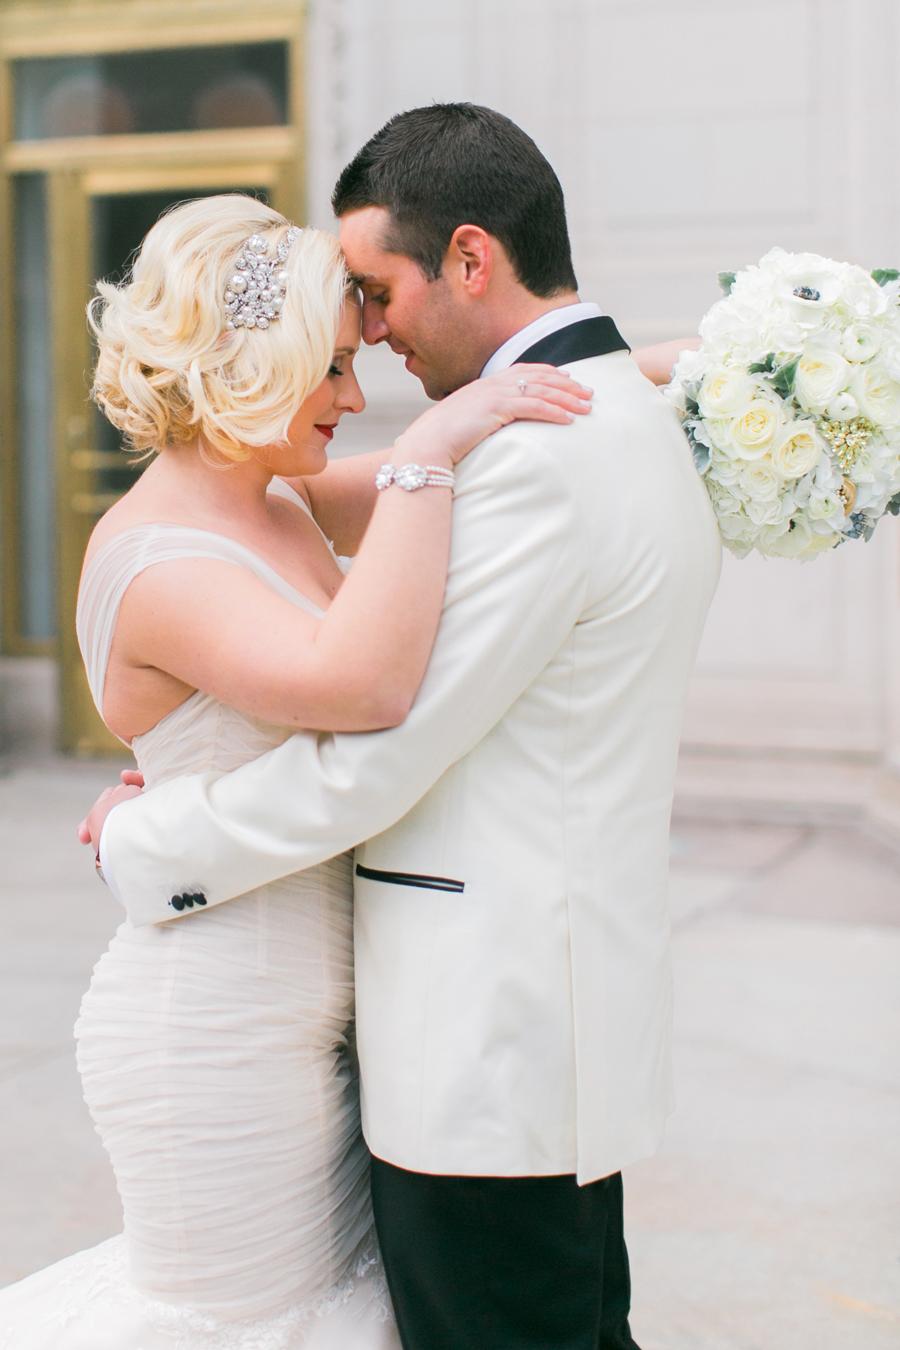 artistrie-co-best-wedding-photos-2015-007